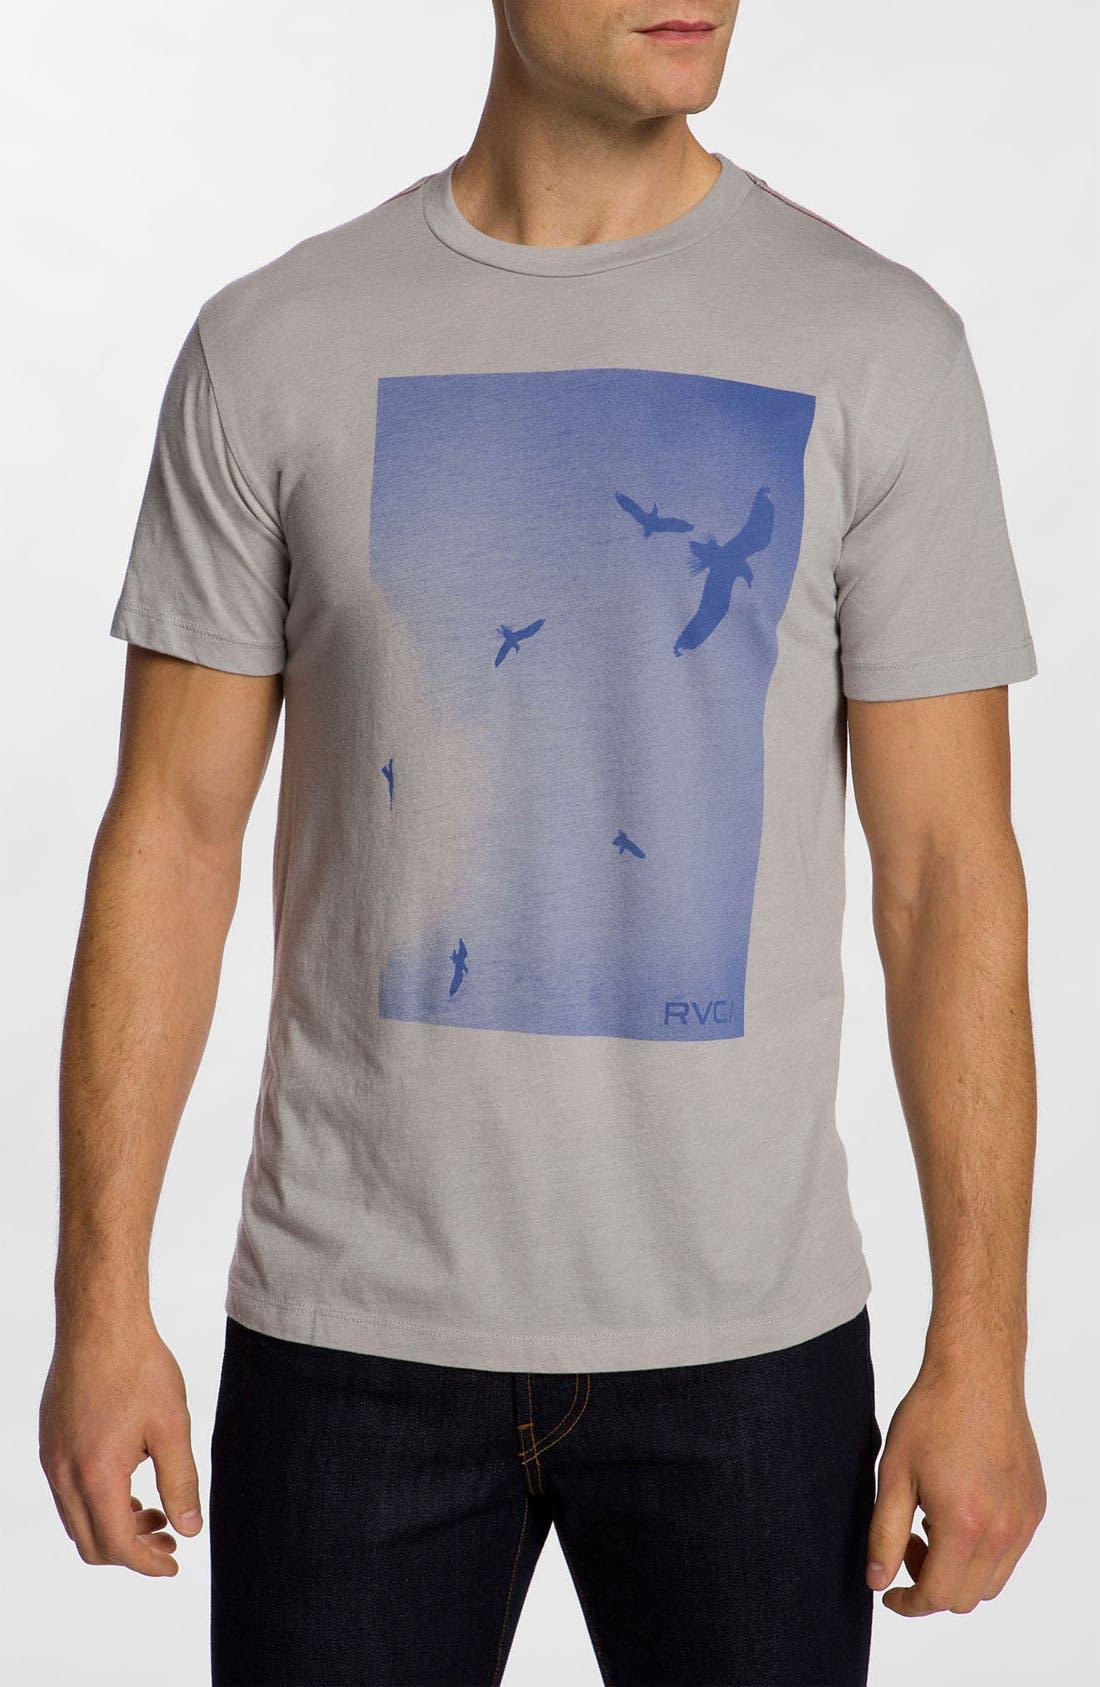 Alternate Image 1 Selected - RVCA 'Gulls' T-Shirt